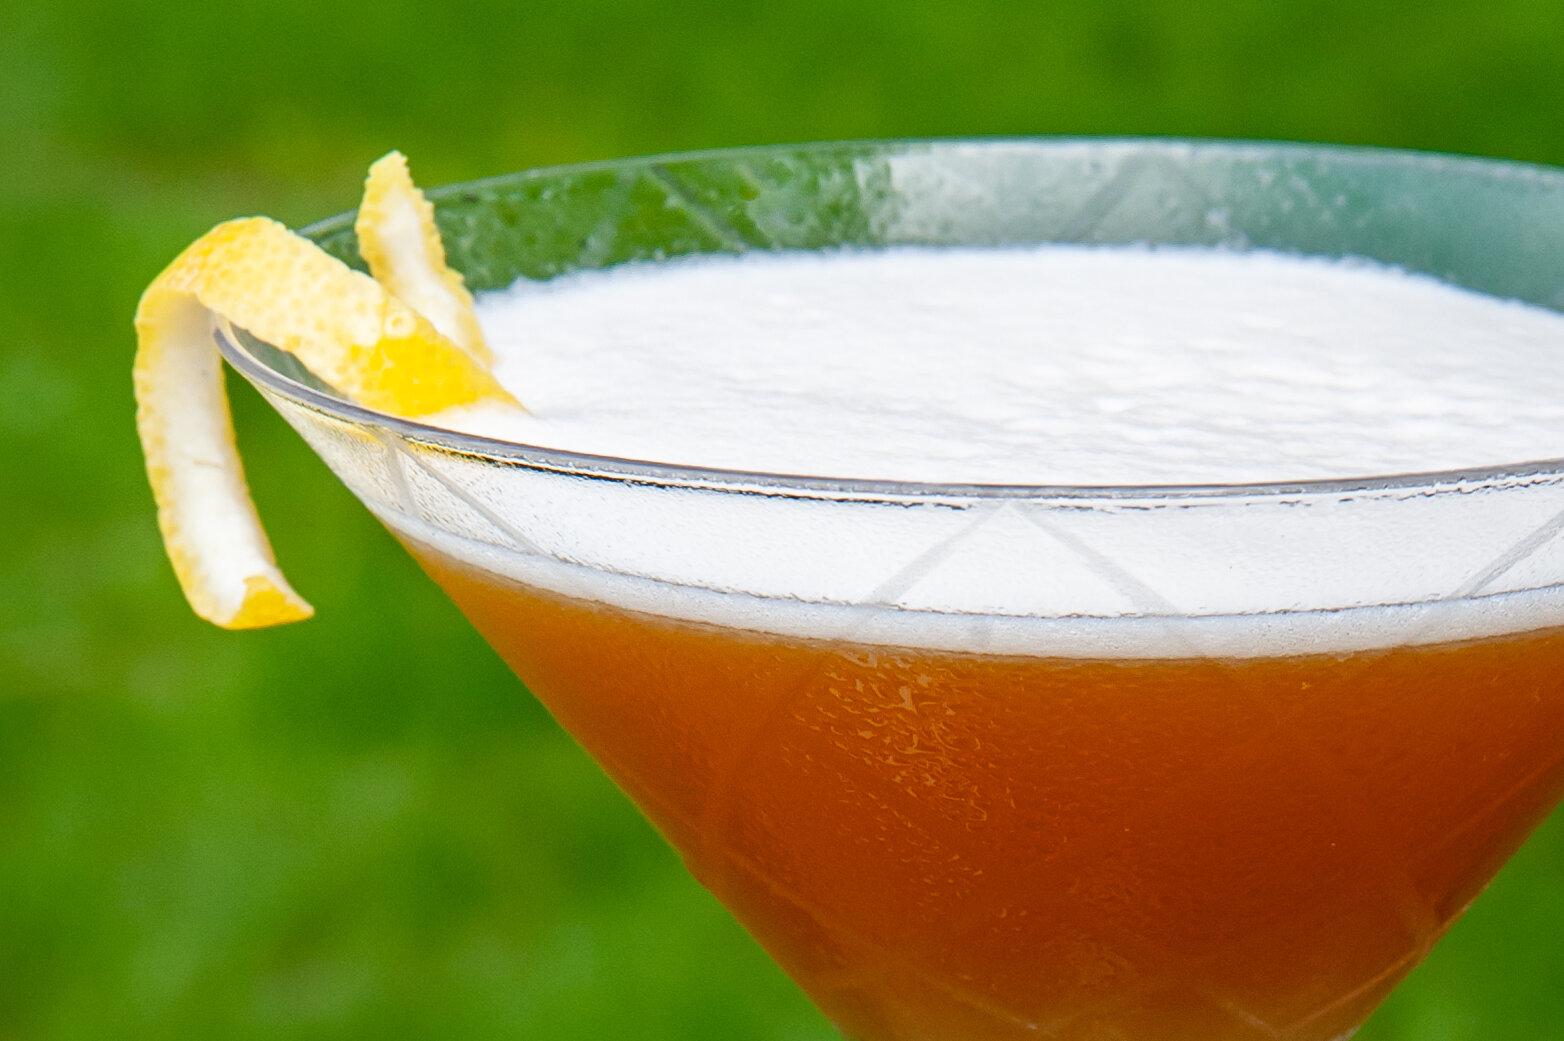 French martini - 2 oz Glacial Lakes Vodka 2.5 oz Pineapple Juice.25 oz ChambordShaken and poured into chilled martini glassGarnish with lemon twist